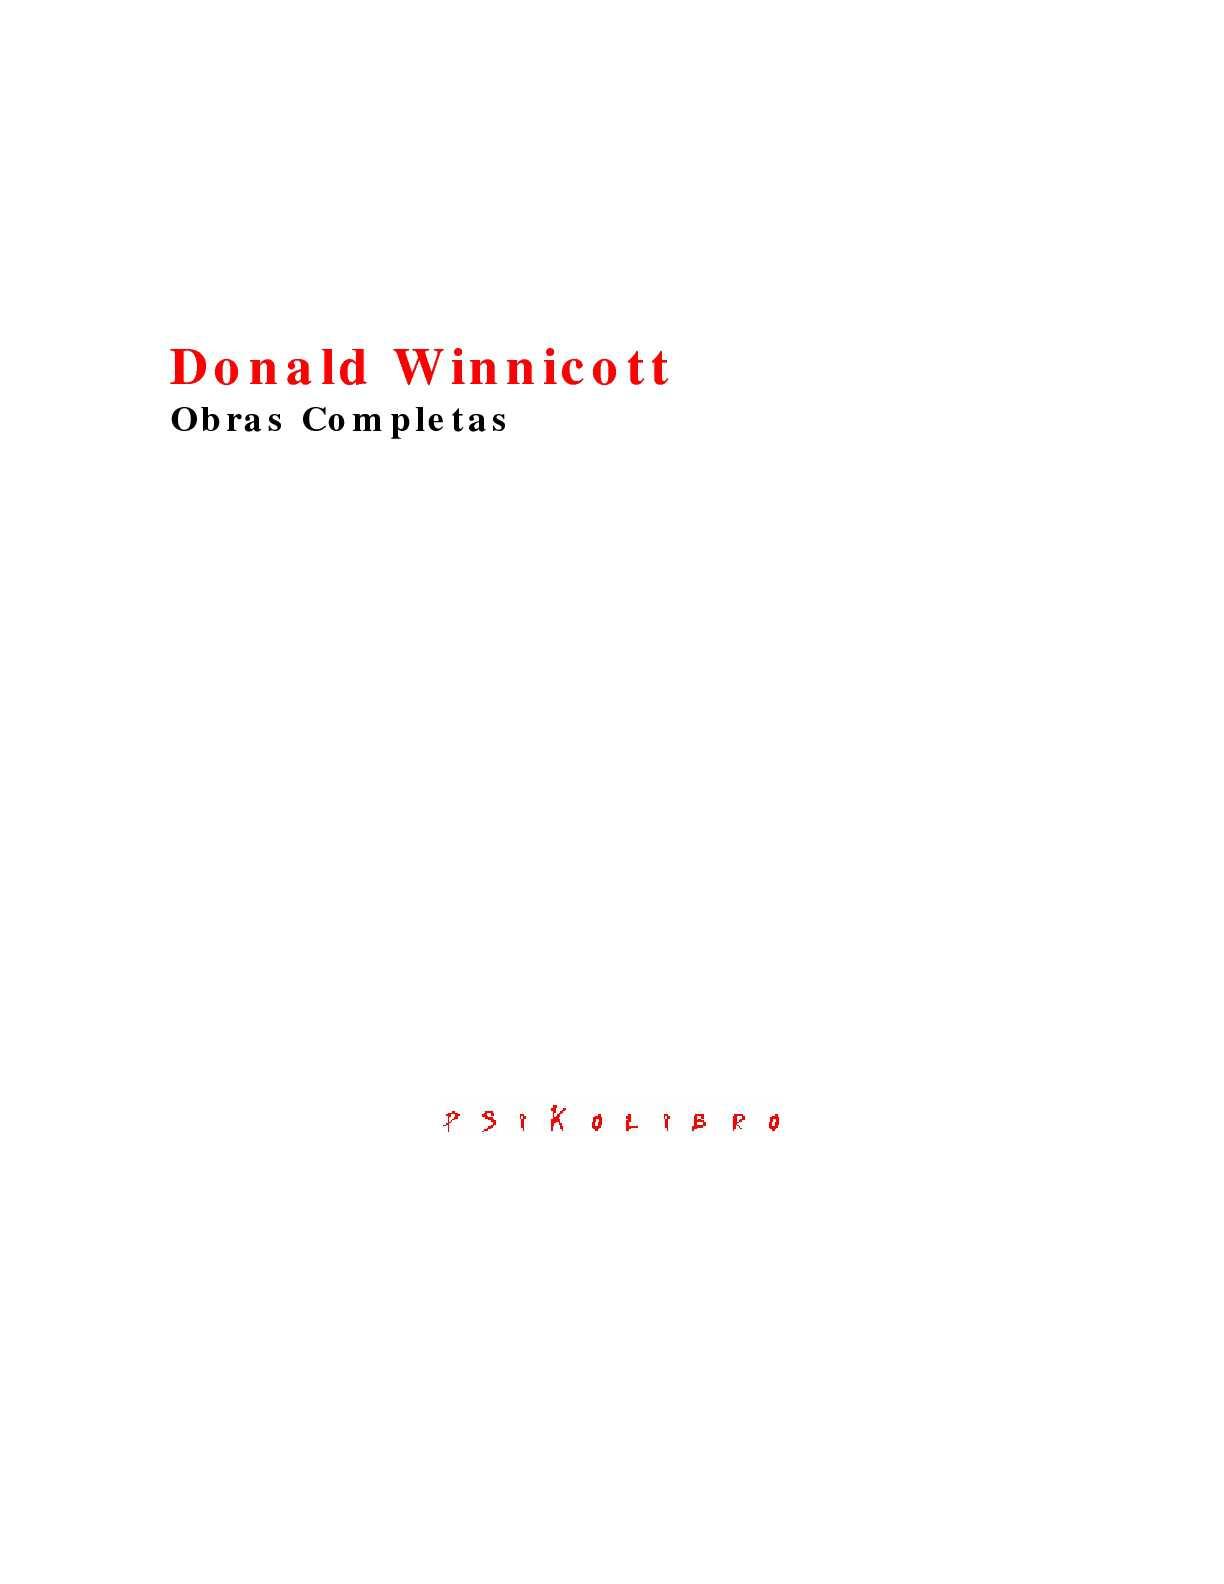 Calaméo - Donald Winnicott - Obras Completas